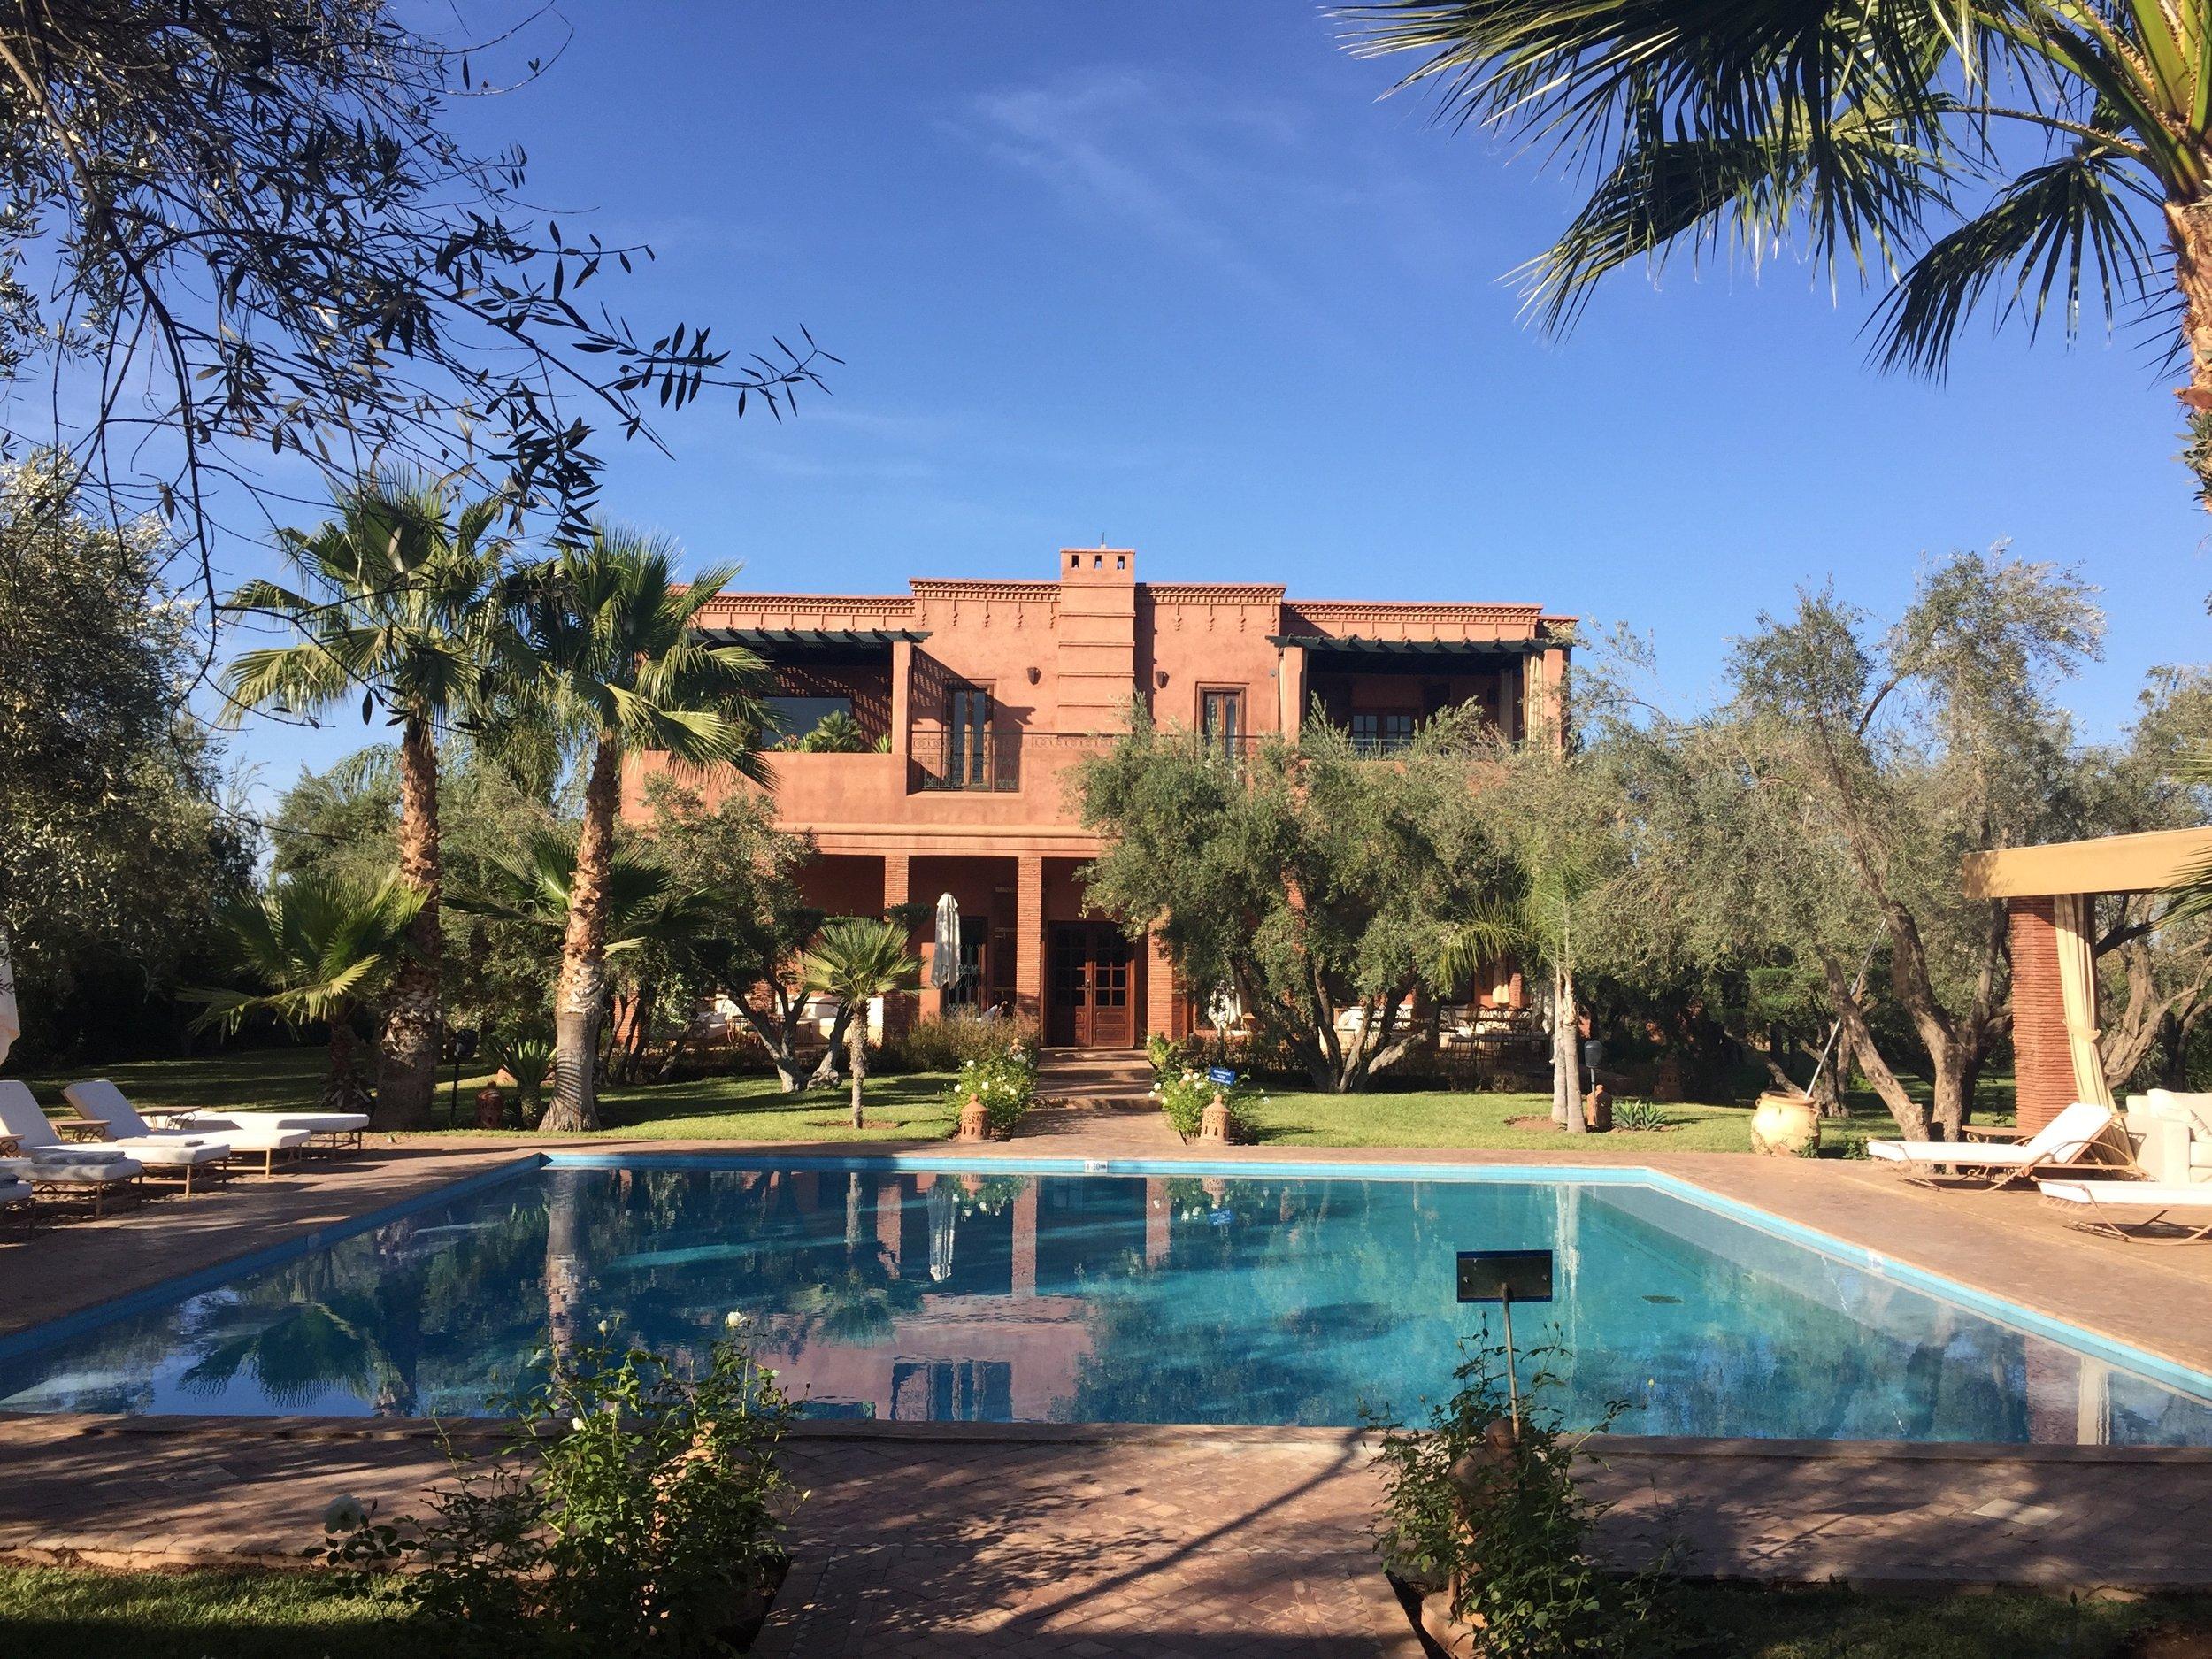 An oasis outside Marrakech